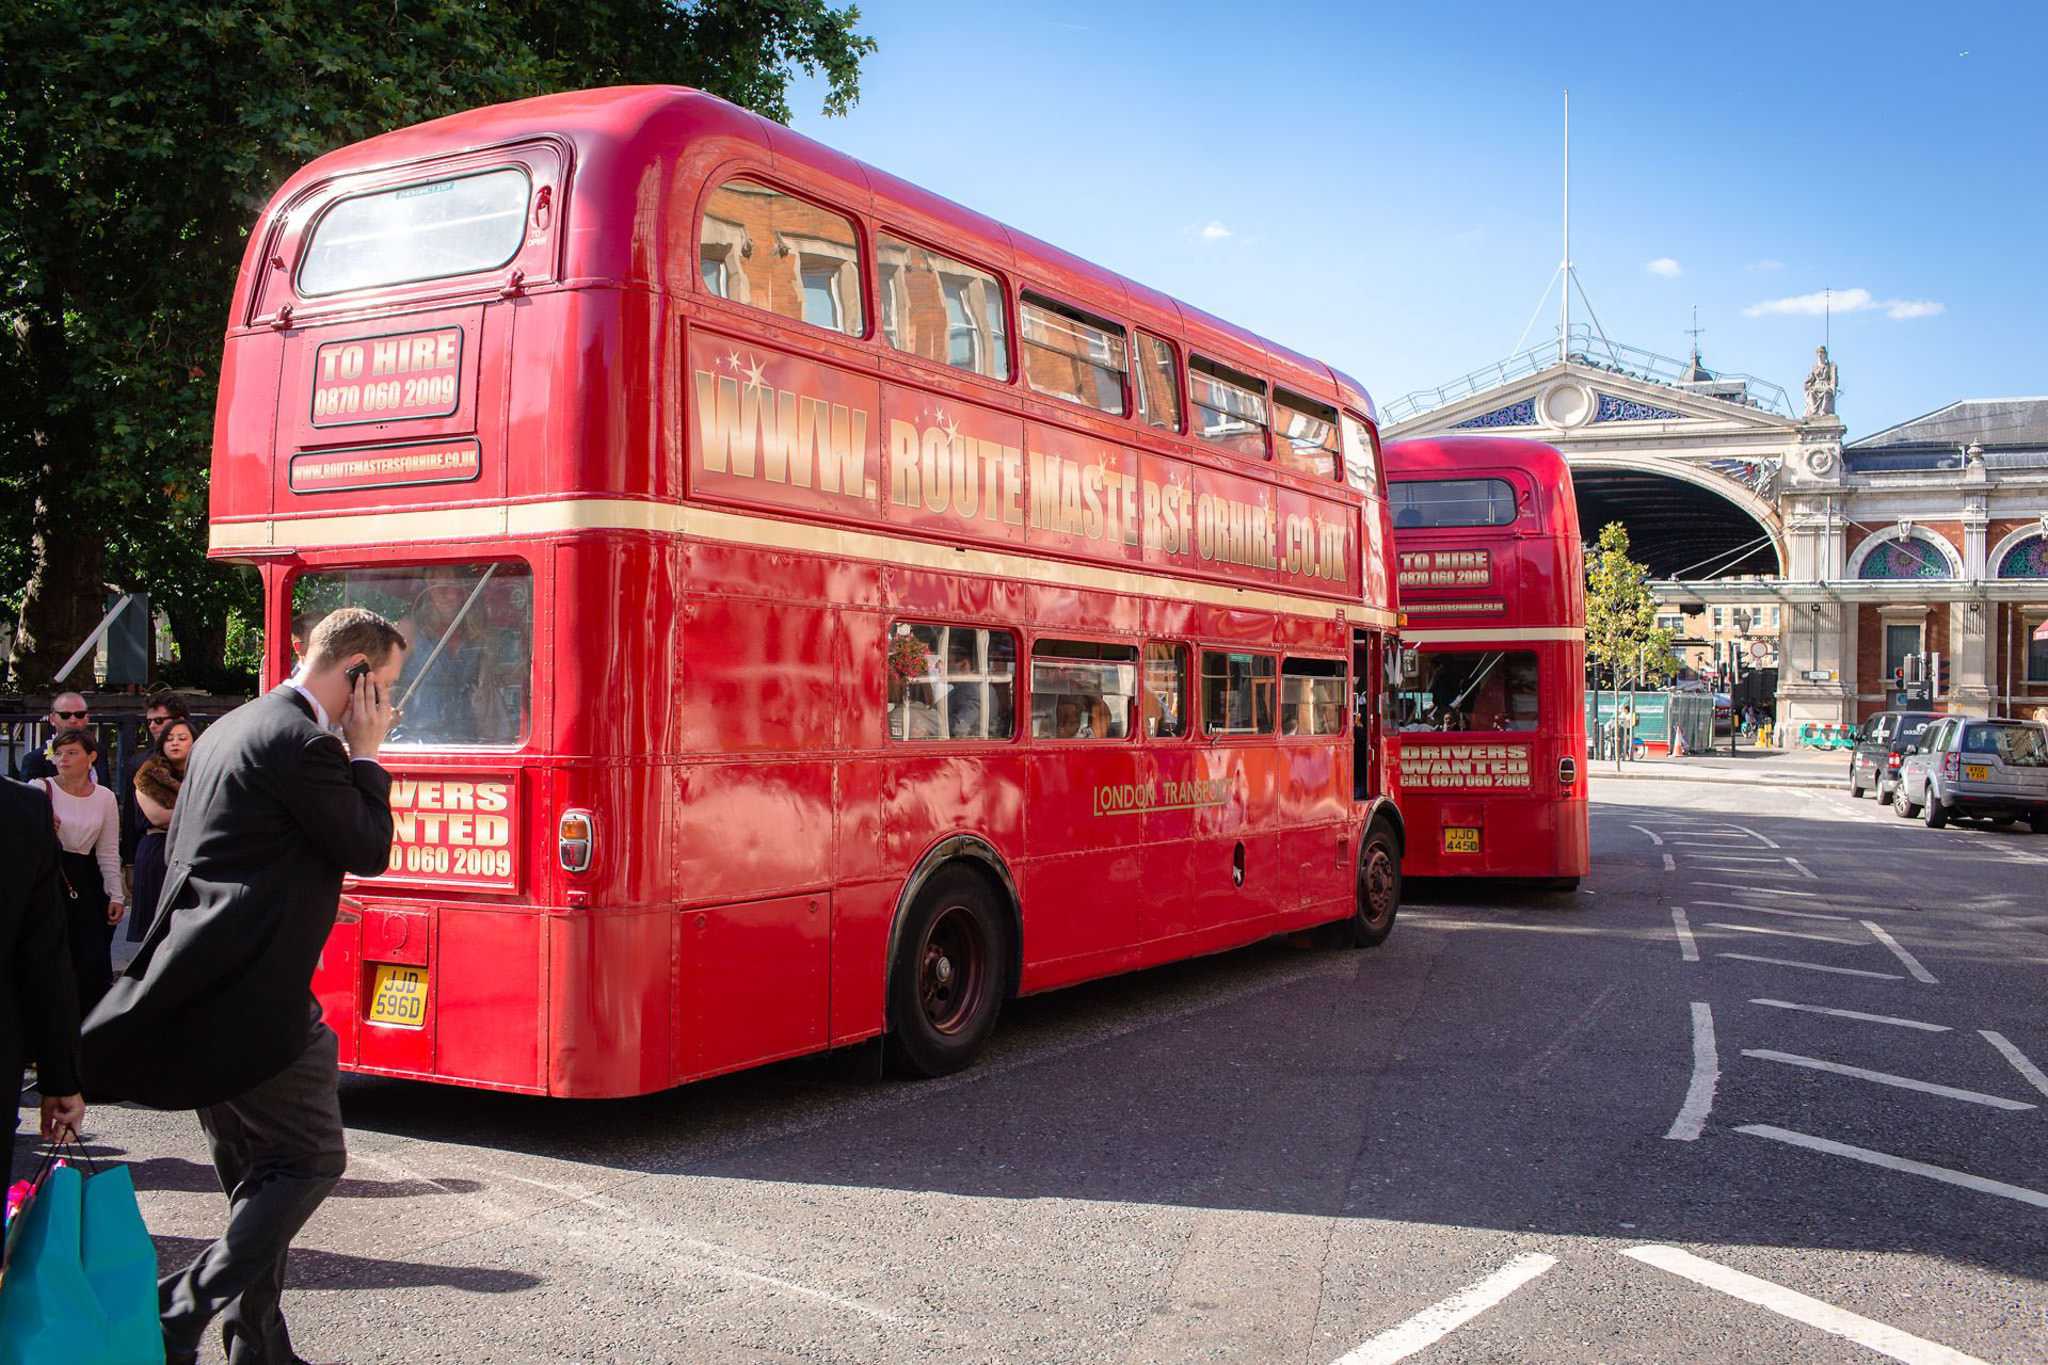 St. Pancras hotel wedding busses